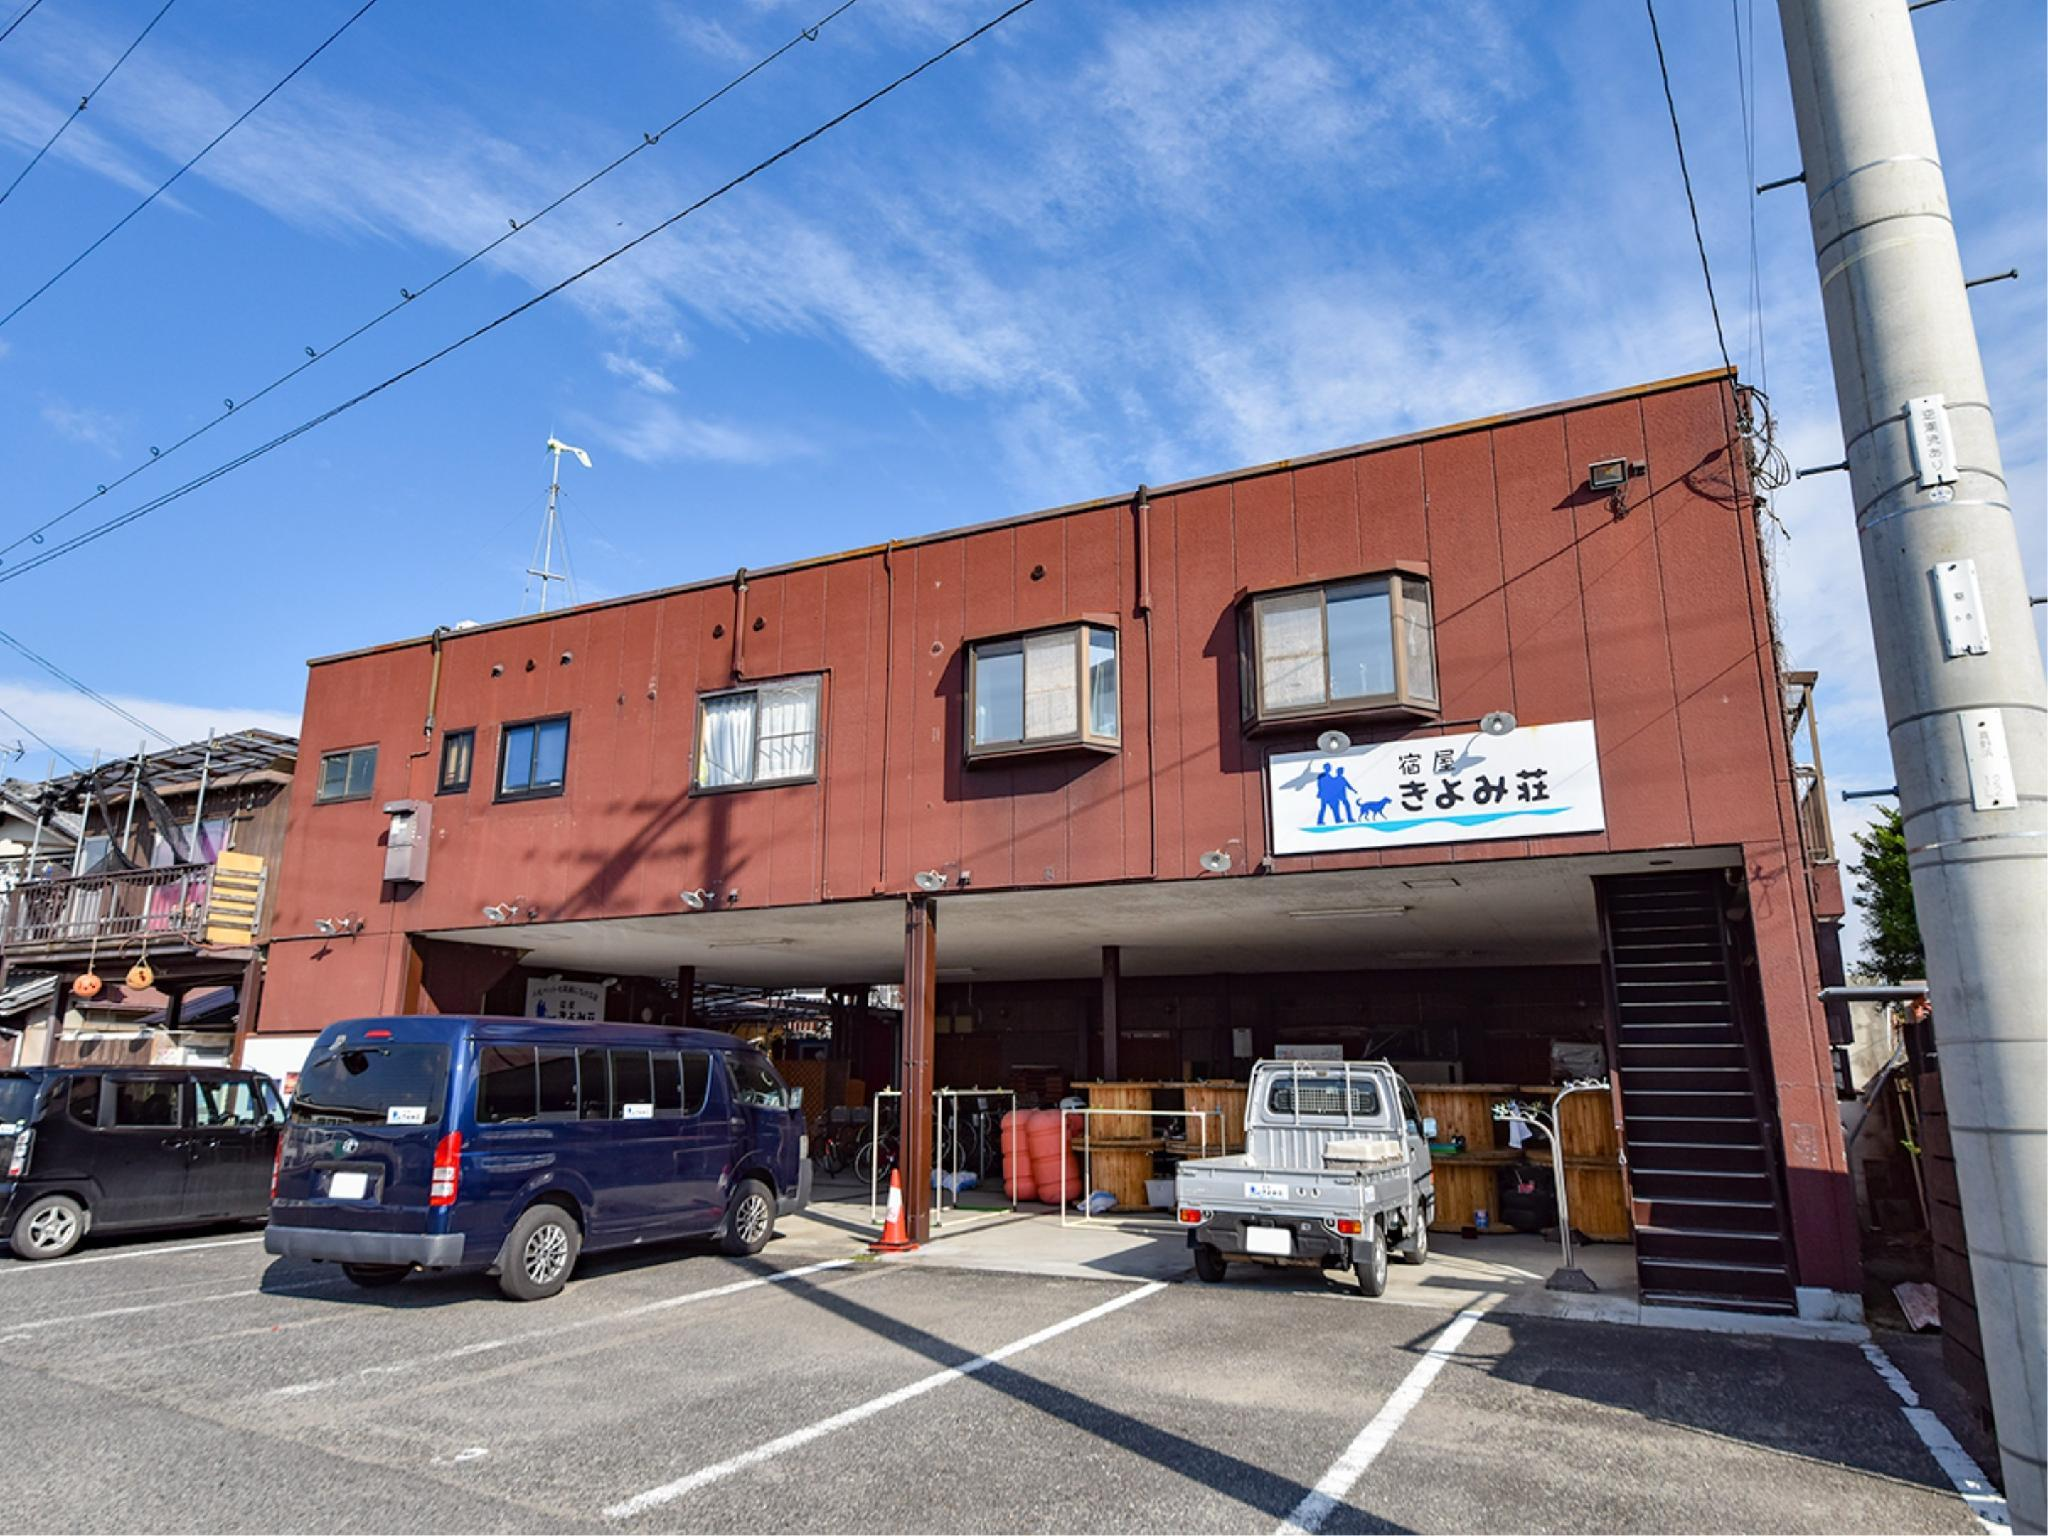 Kiyomiso